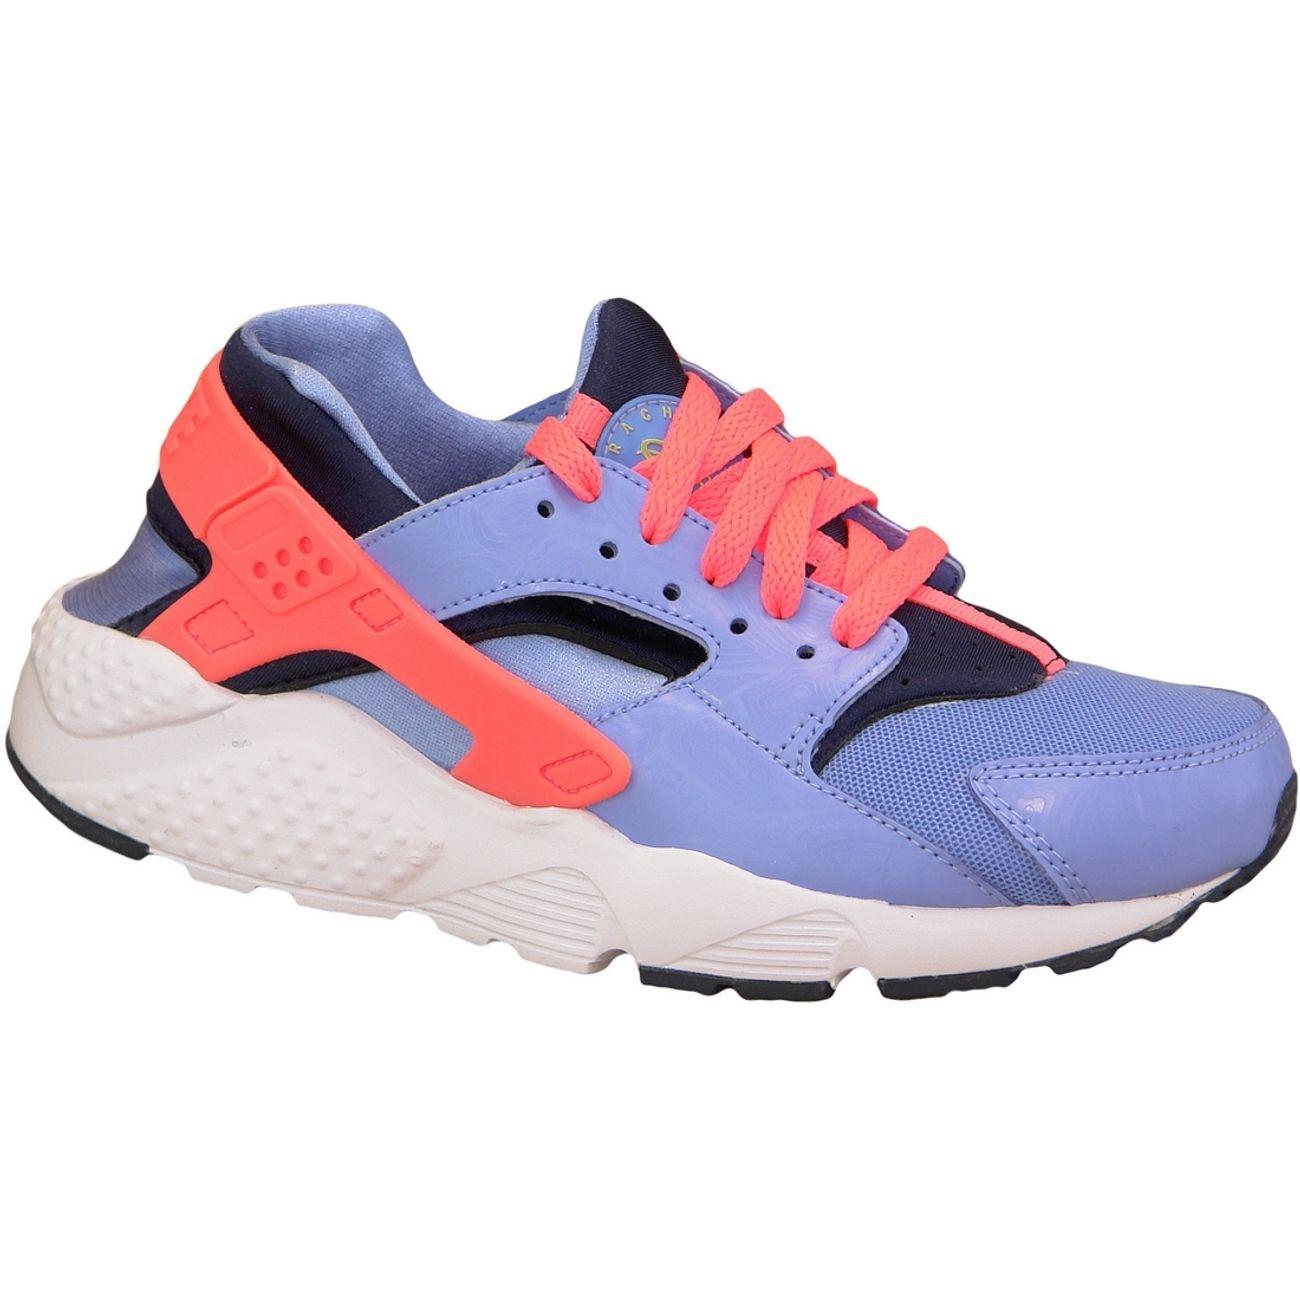 Mode- Lifestyle enfant NIKE Nike Huarache Run Gs  654280-402